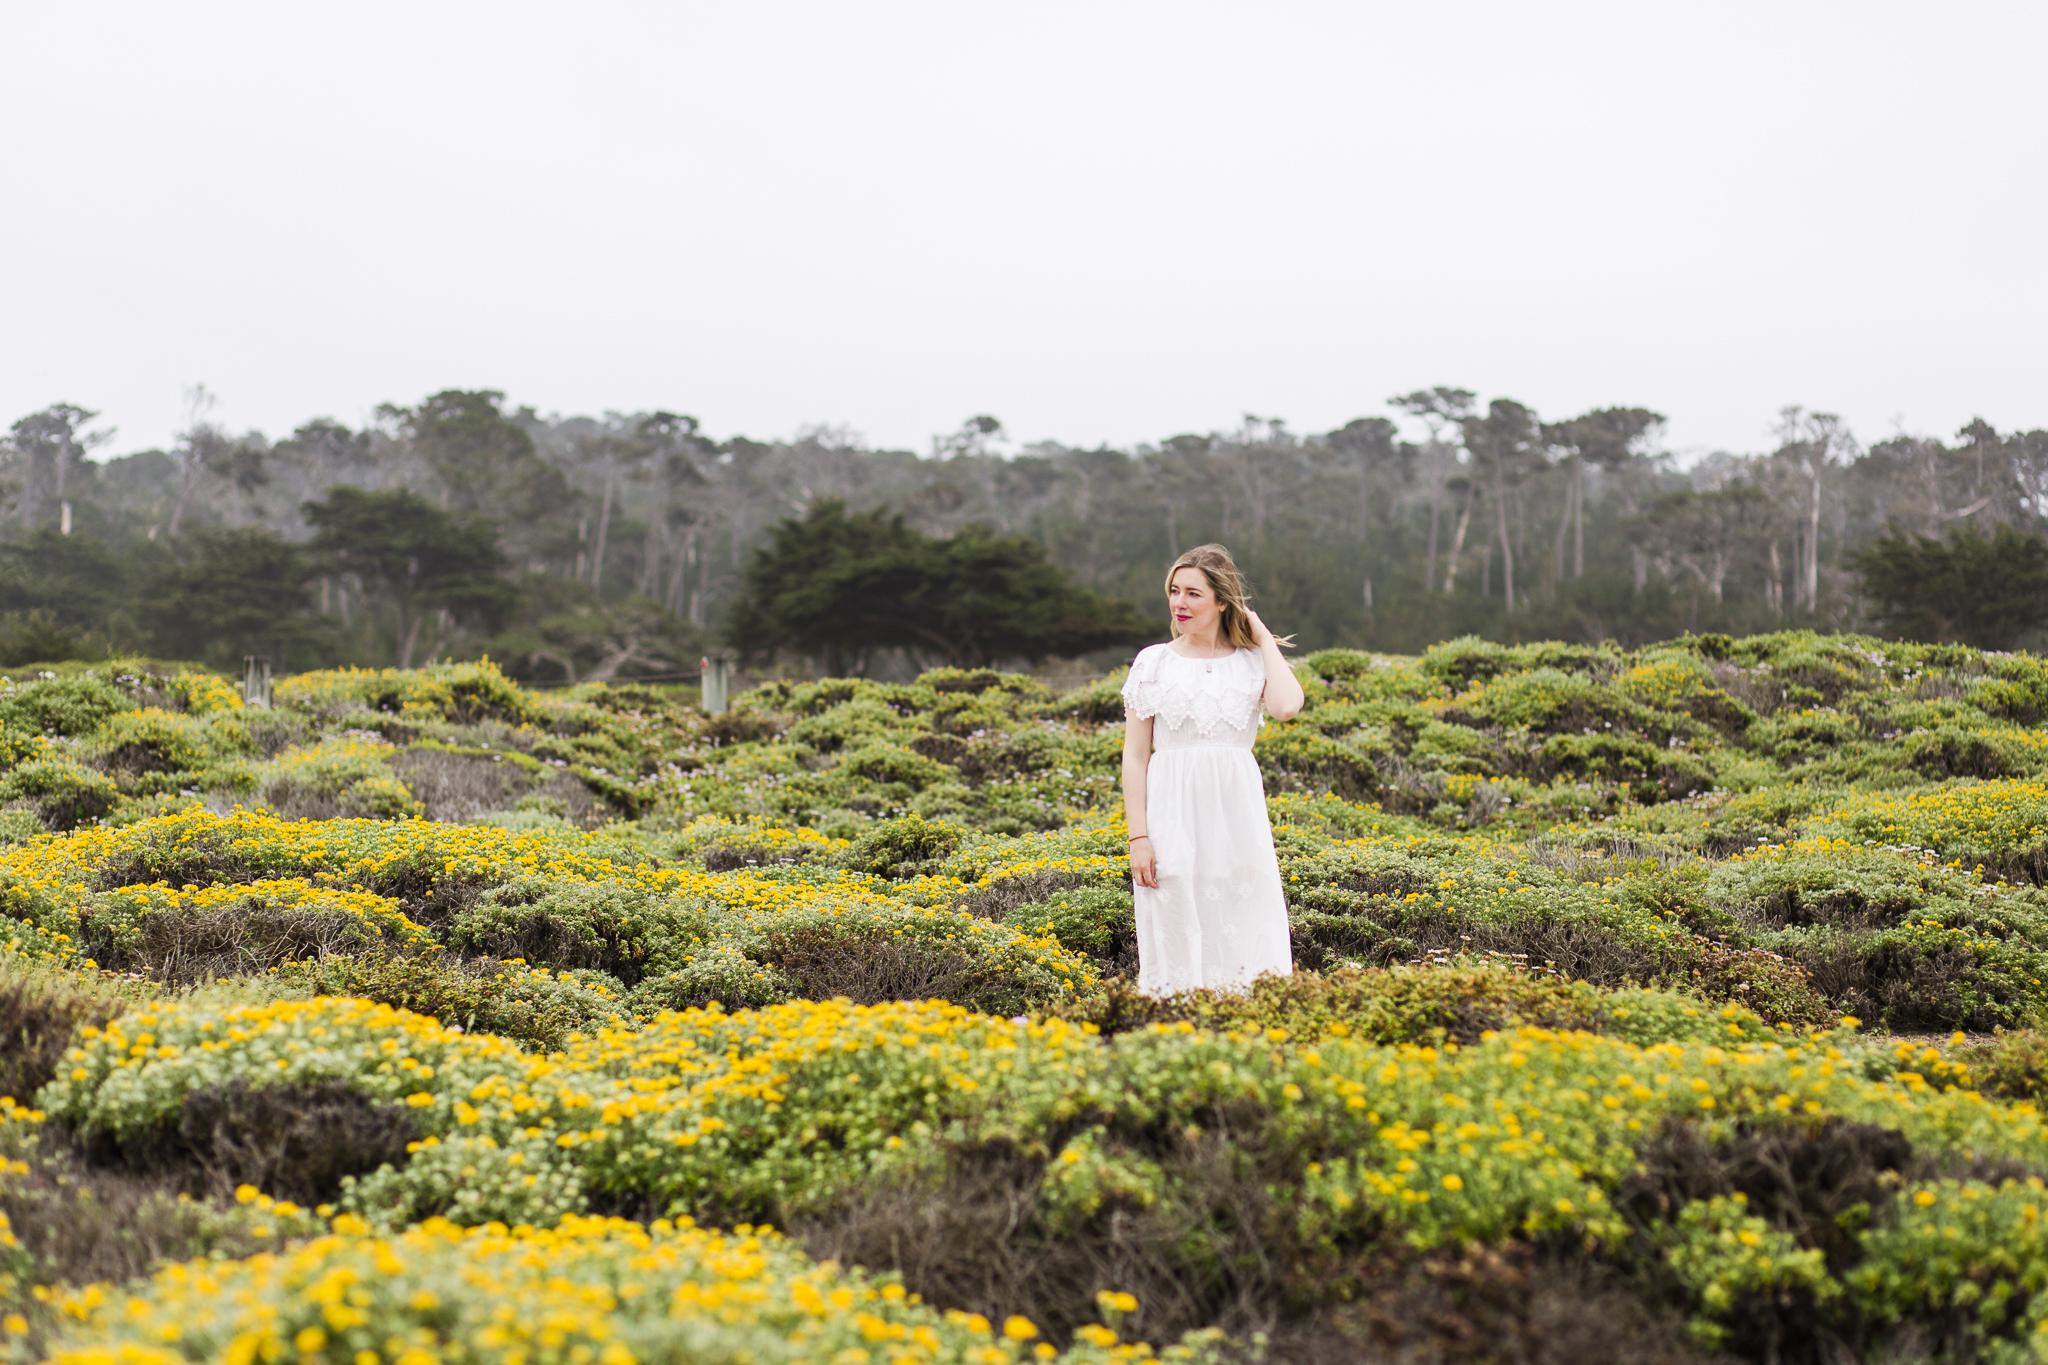 14 weeks pregnant, on 17-mile drive in Carmel, California